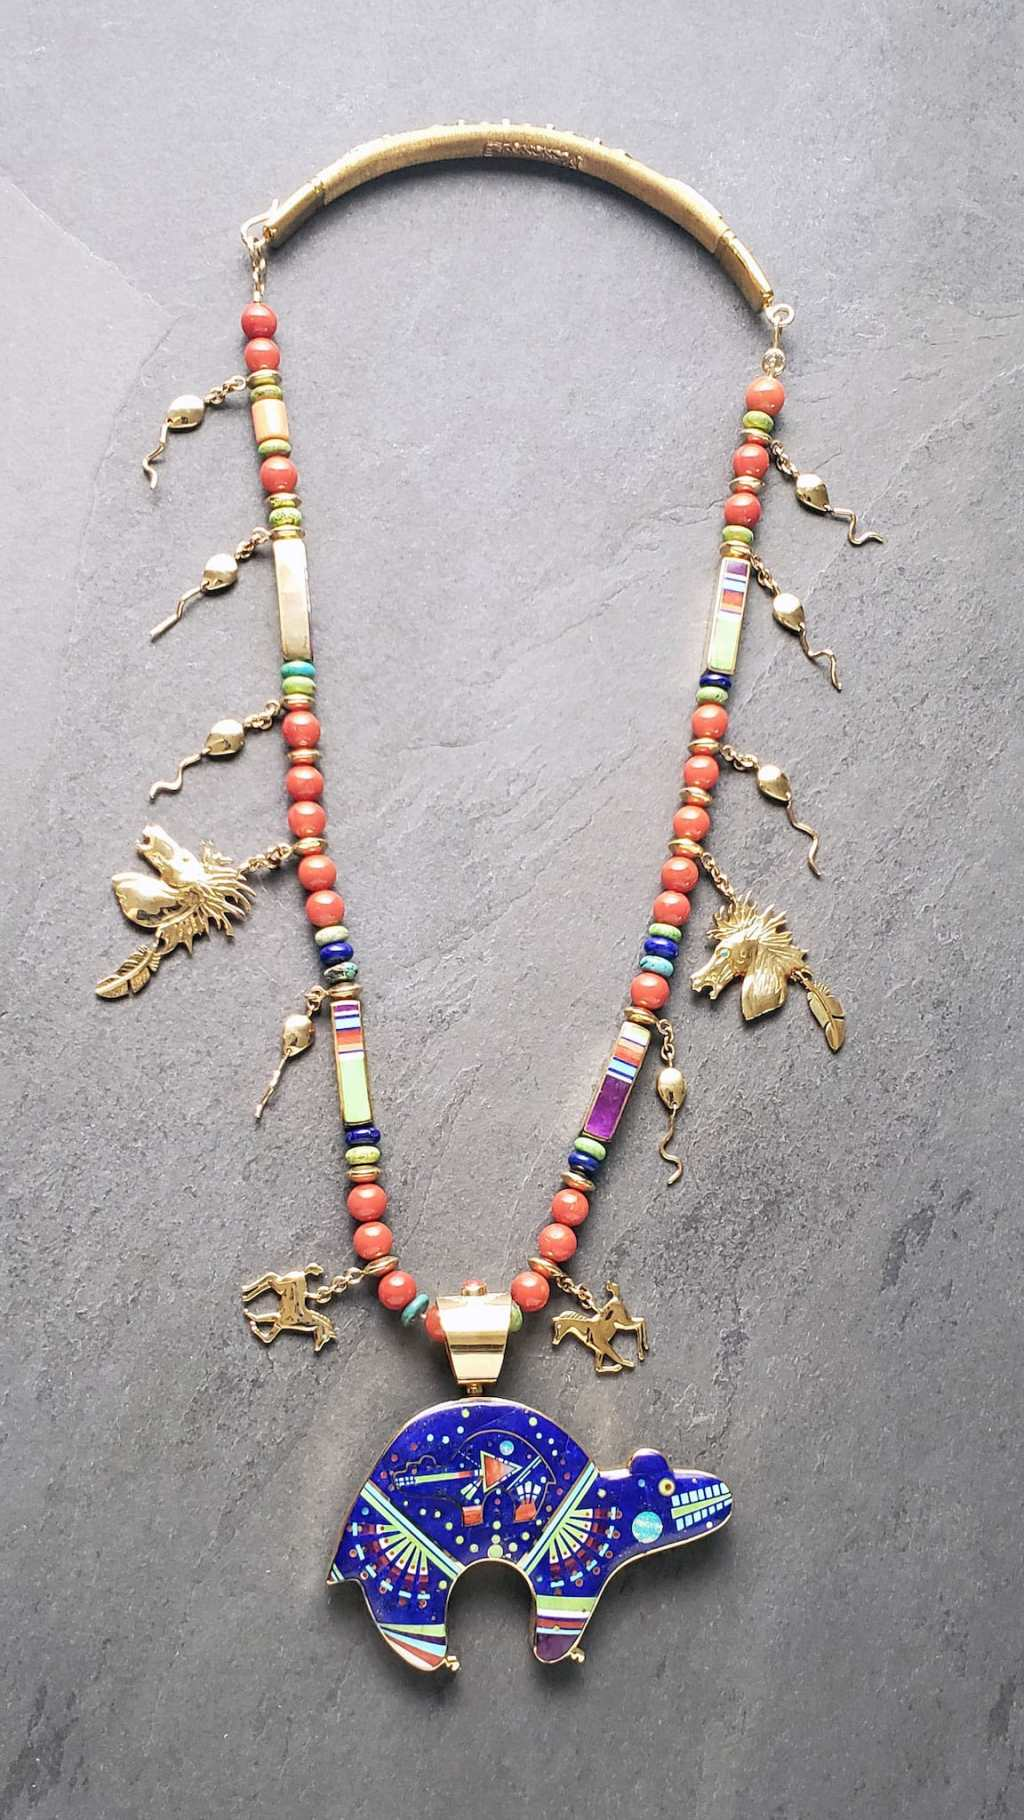 Jesse Monongya, Bear Necklace, 2004. Denise Kang photo. JEWELRY episode of Craft in America